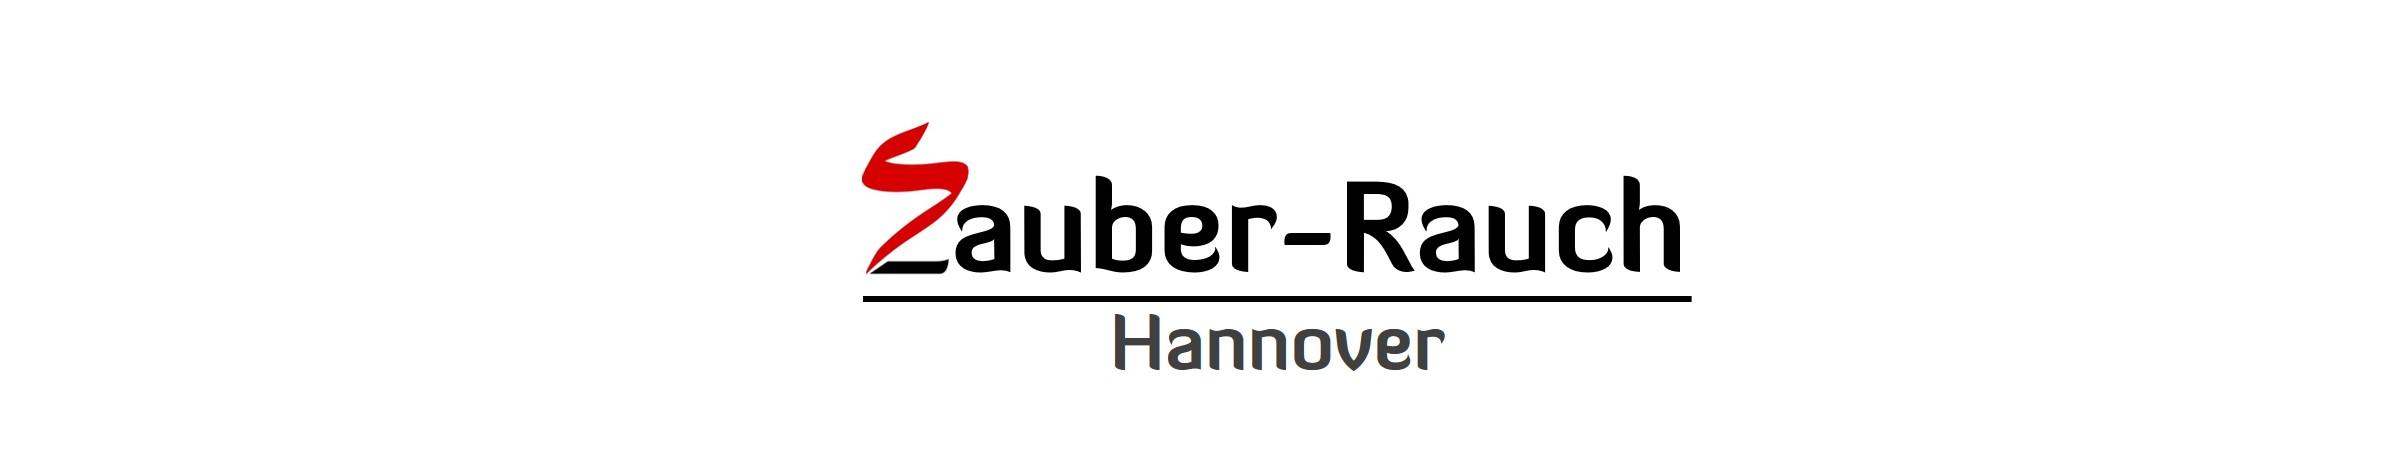 Zauber-Rauch-Hannover